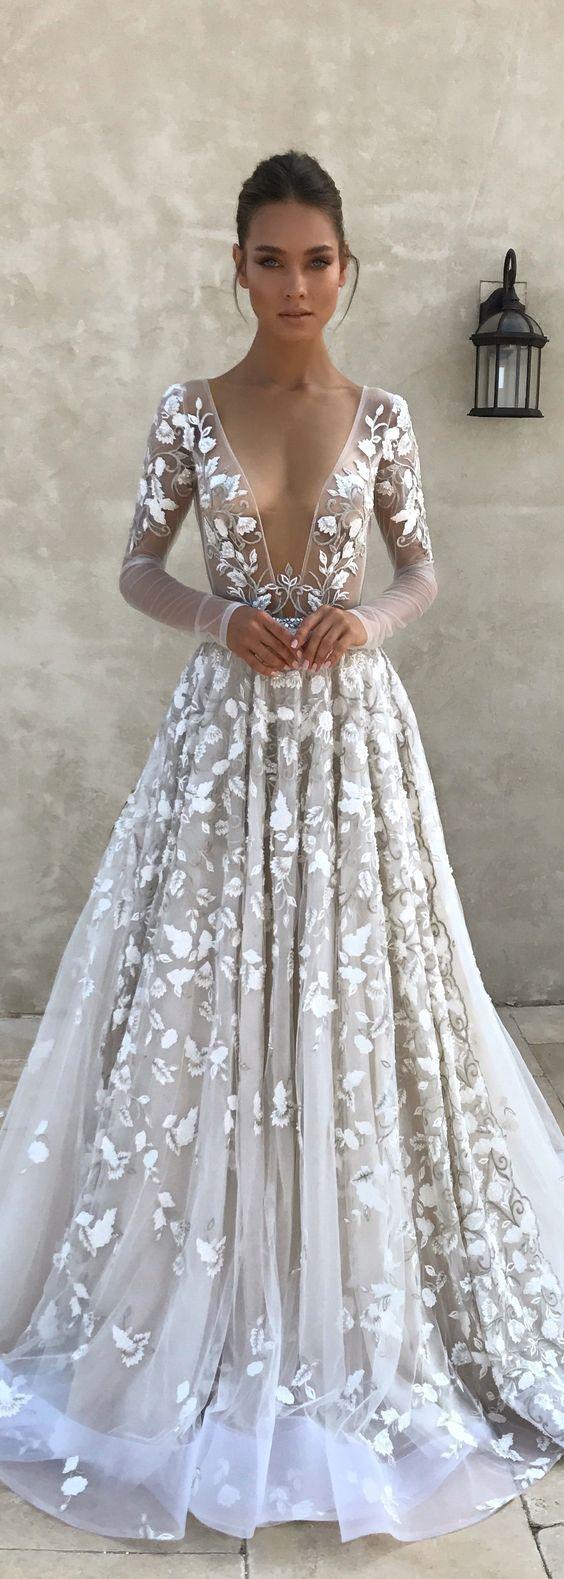 Sheer long sleeve wedding dress  Stunning Luxury Sexy Tulle Wedding Dresses Sexy Deep V Neck Sheer